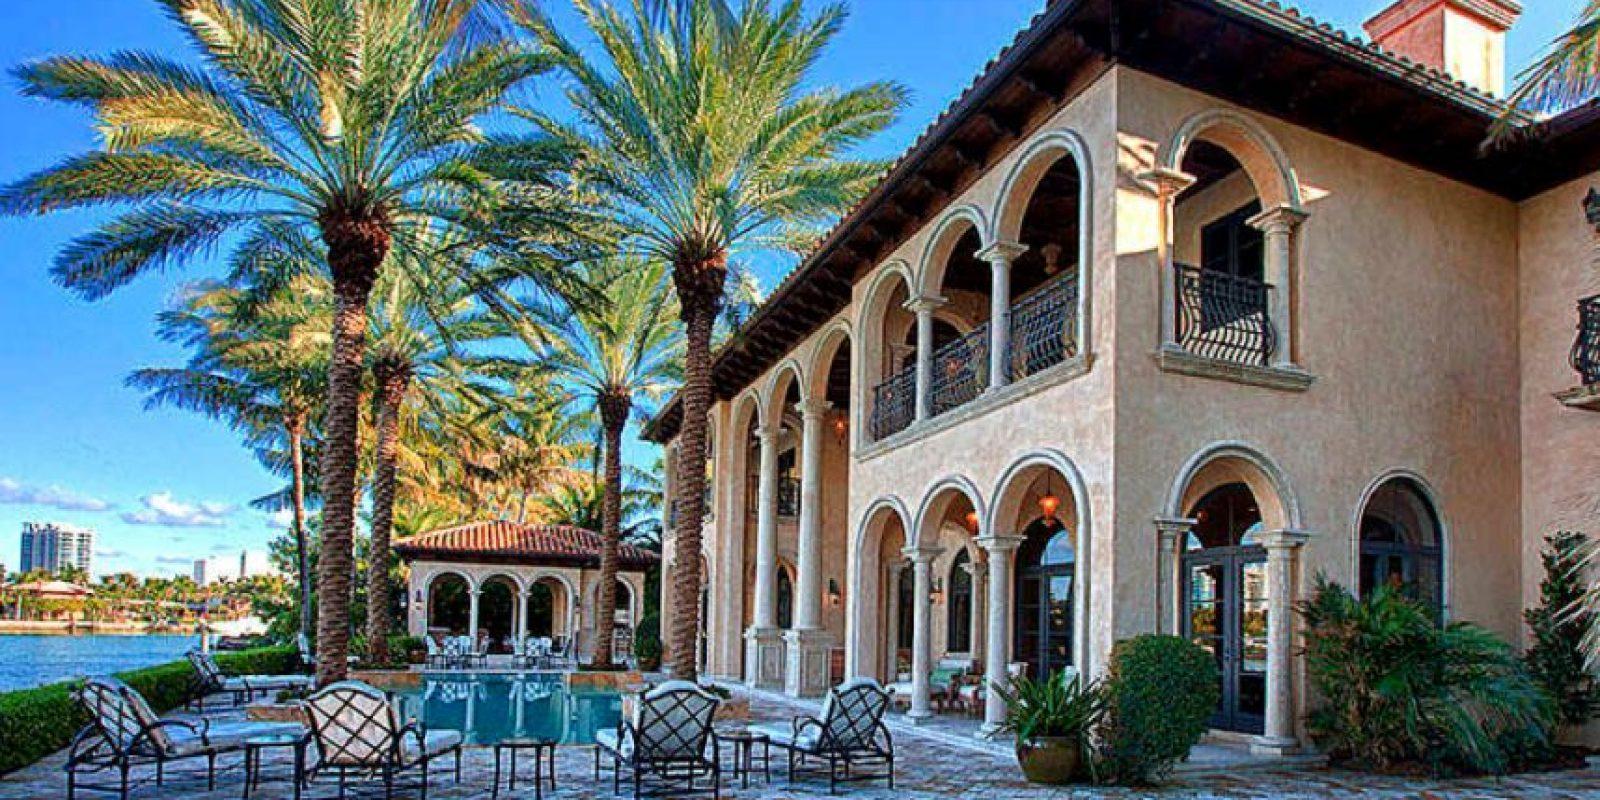 También un Penthouse en Key Byscaine. Foto:vía Micasaenflorida.com